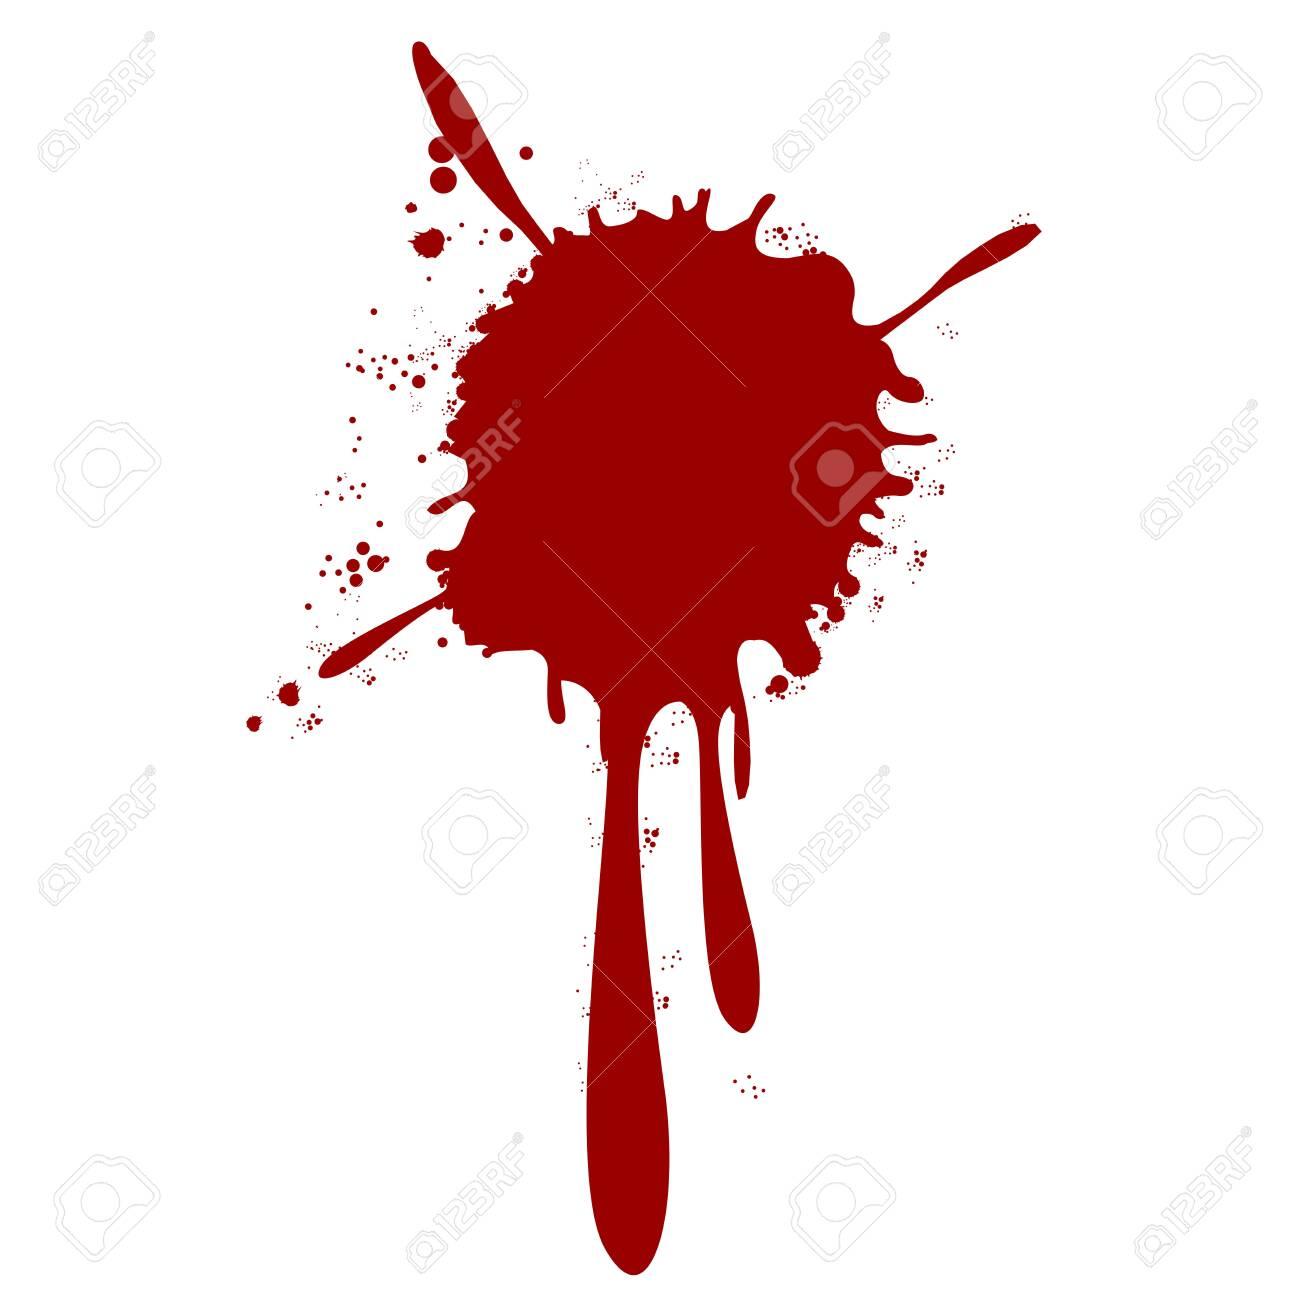 blood splatter splash drop paint - 138768177